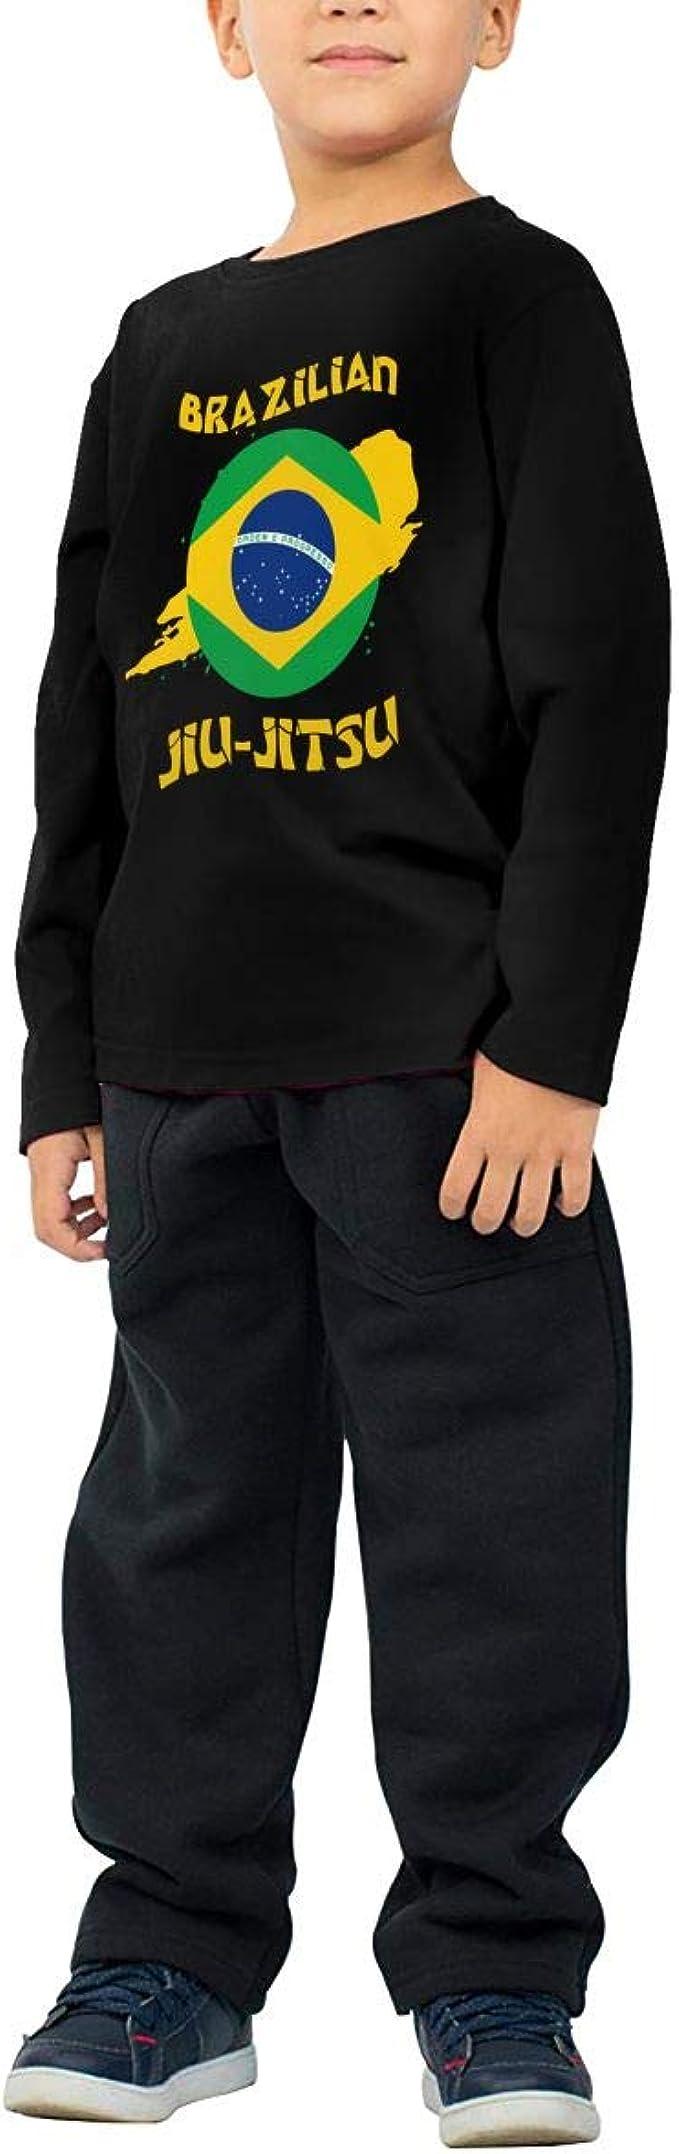 CERTONGCXTS Toddler Jiu Jitsu USA Brazil Flag ComfortSoft Long Sleeve Tee